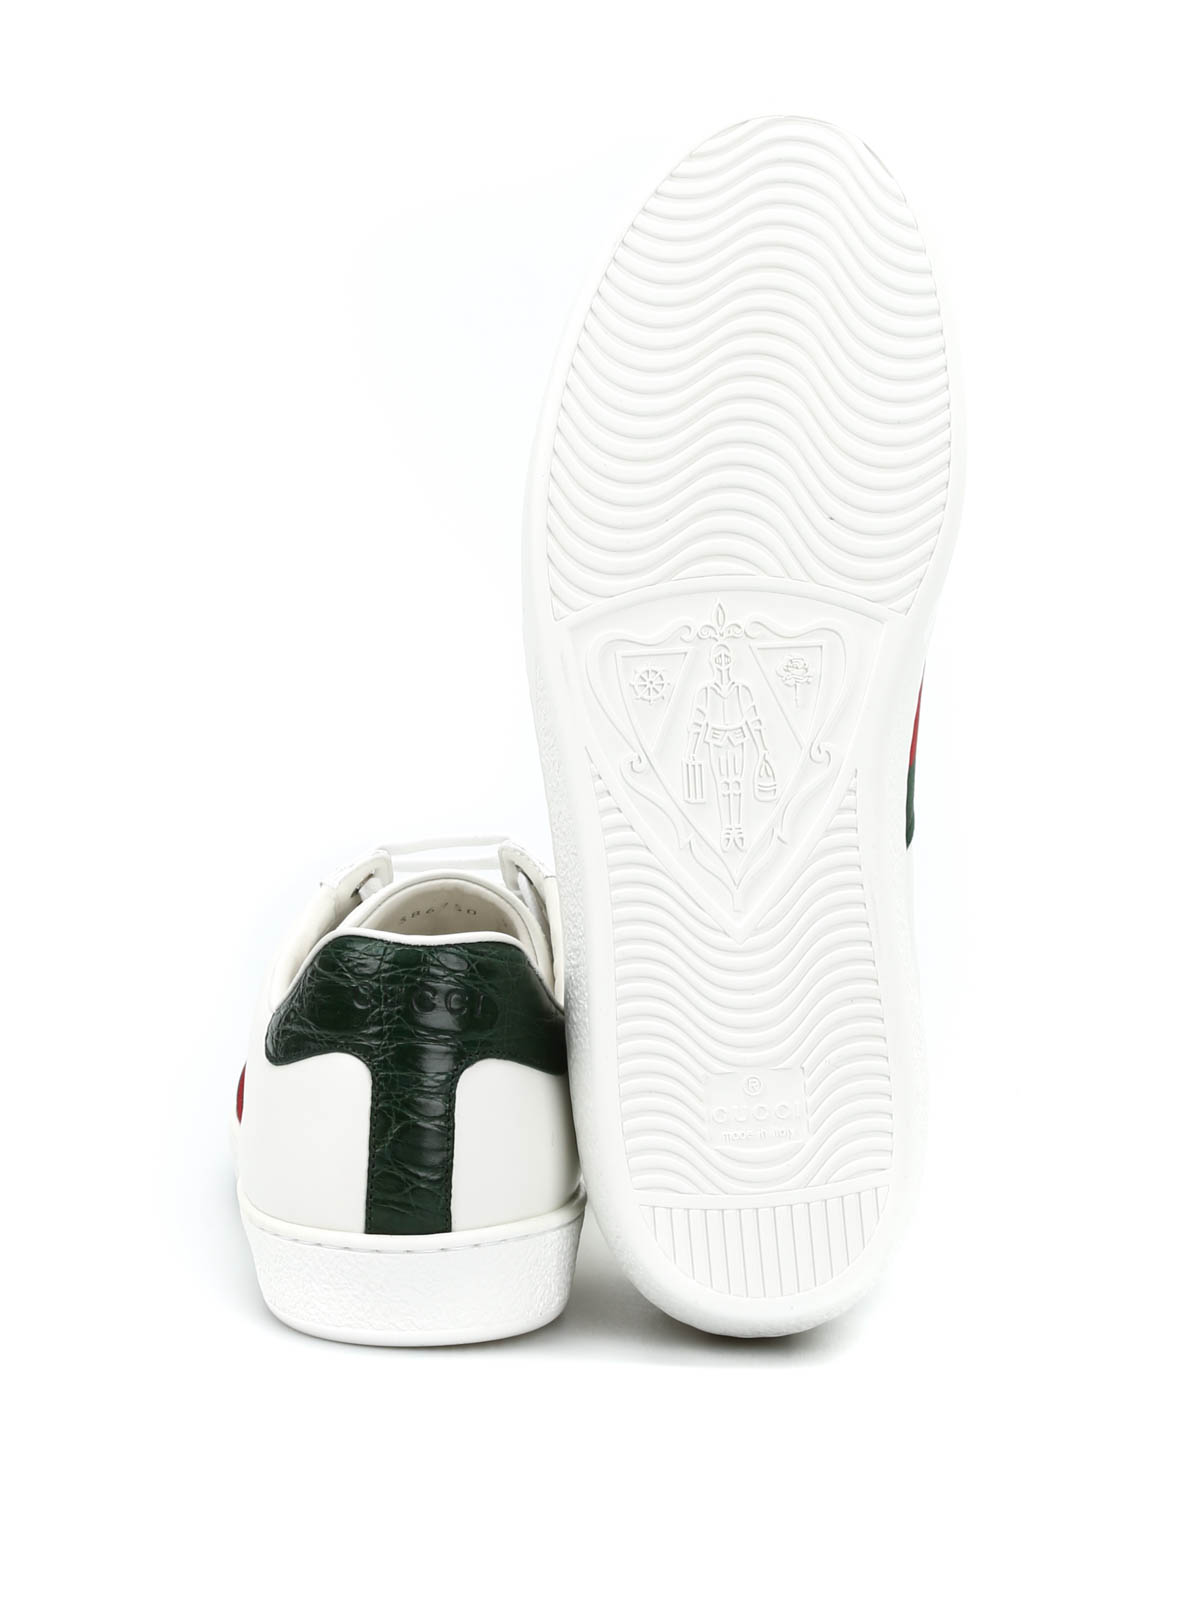 2d940dad505 Gucci - Sneaker Fur Herren - Weiß - Sneaker - 386750 A3830 9071